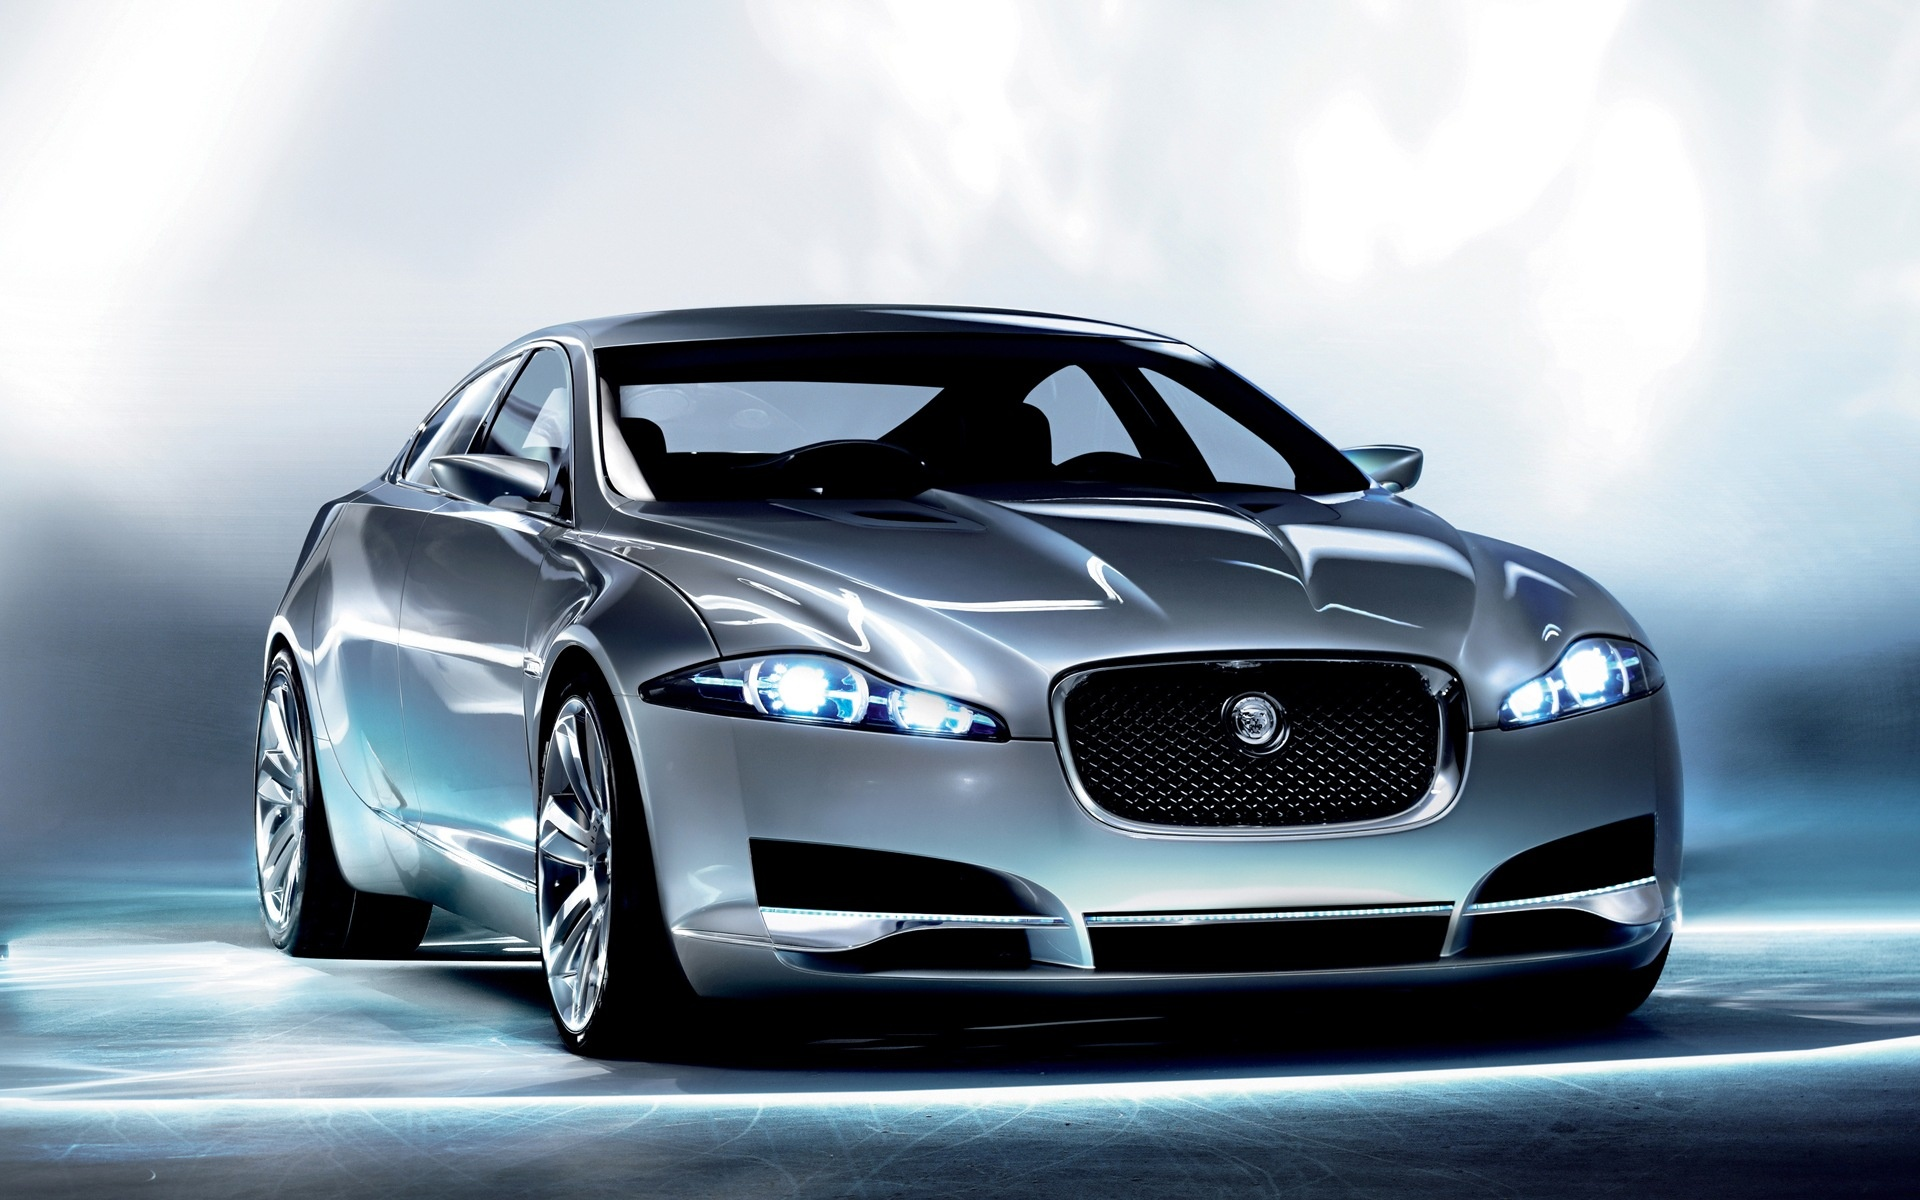 Awesome Jaguar XKR Wallpaper